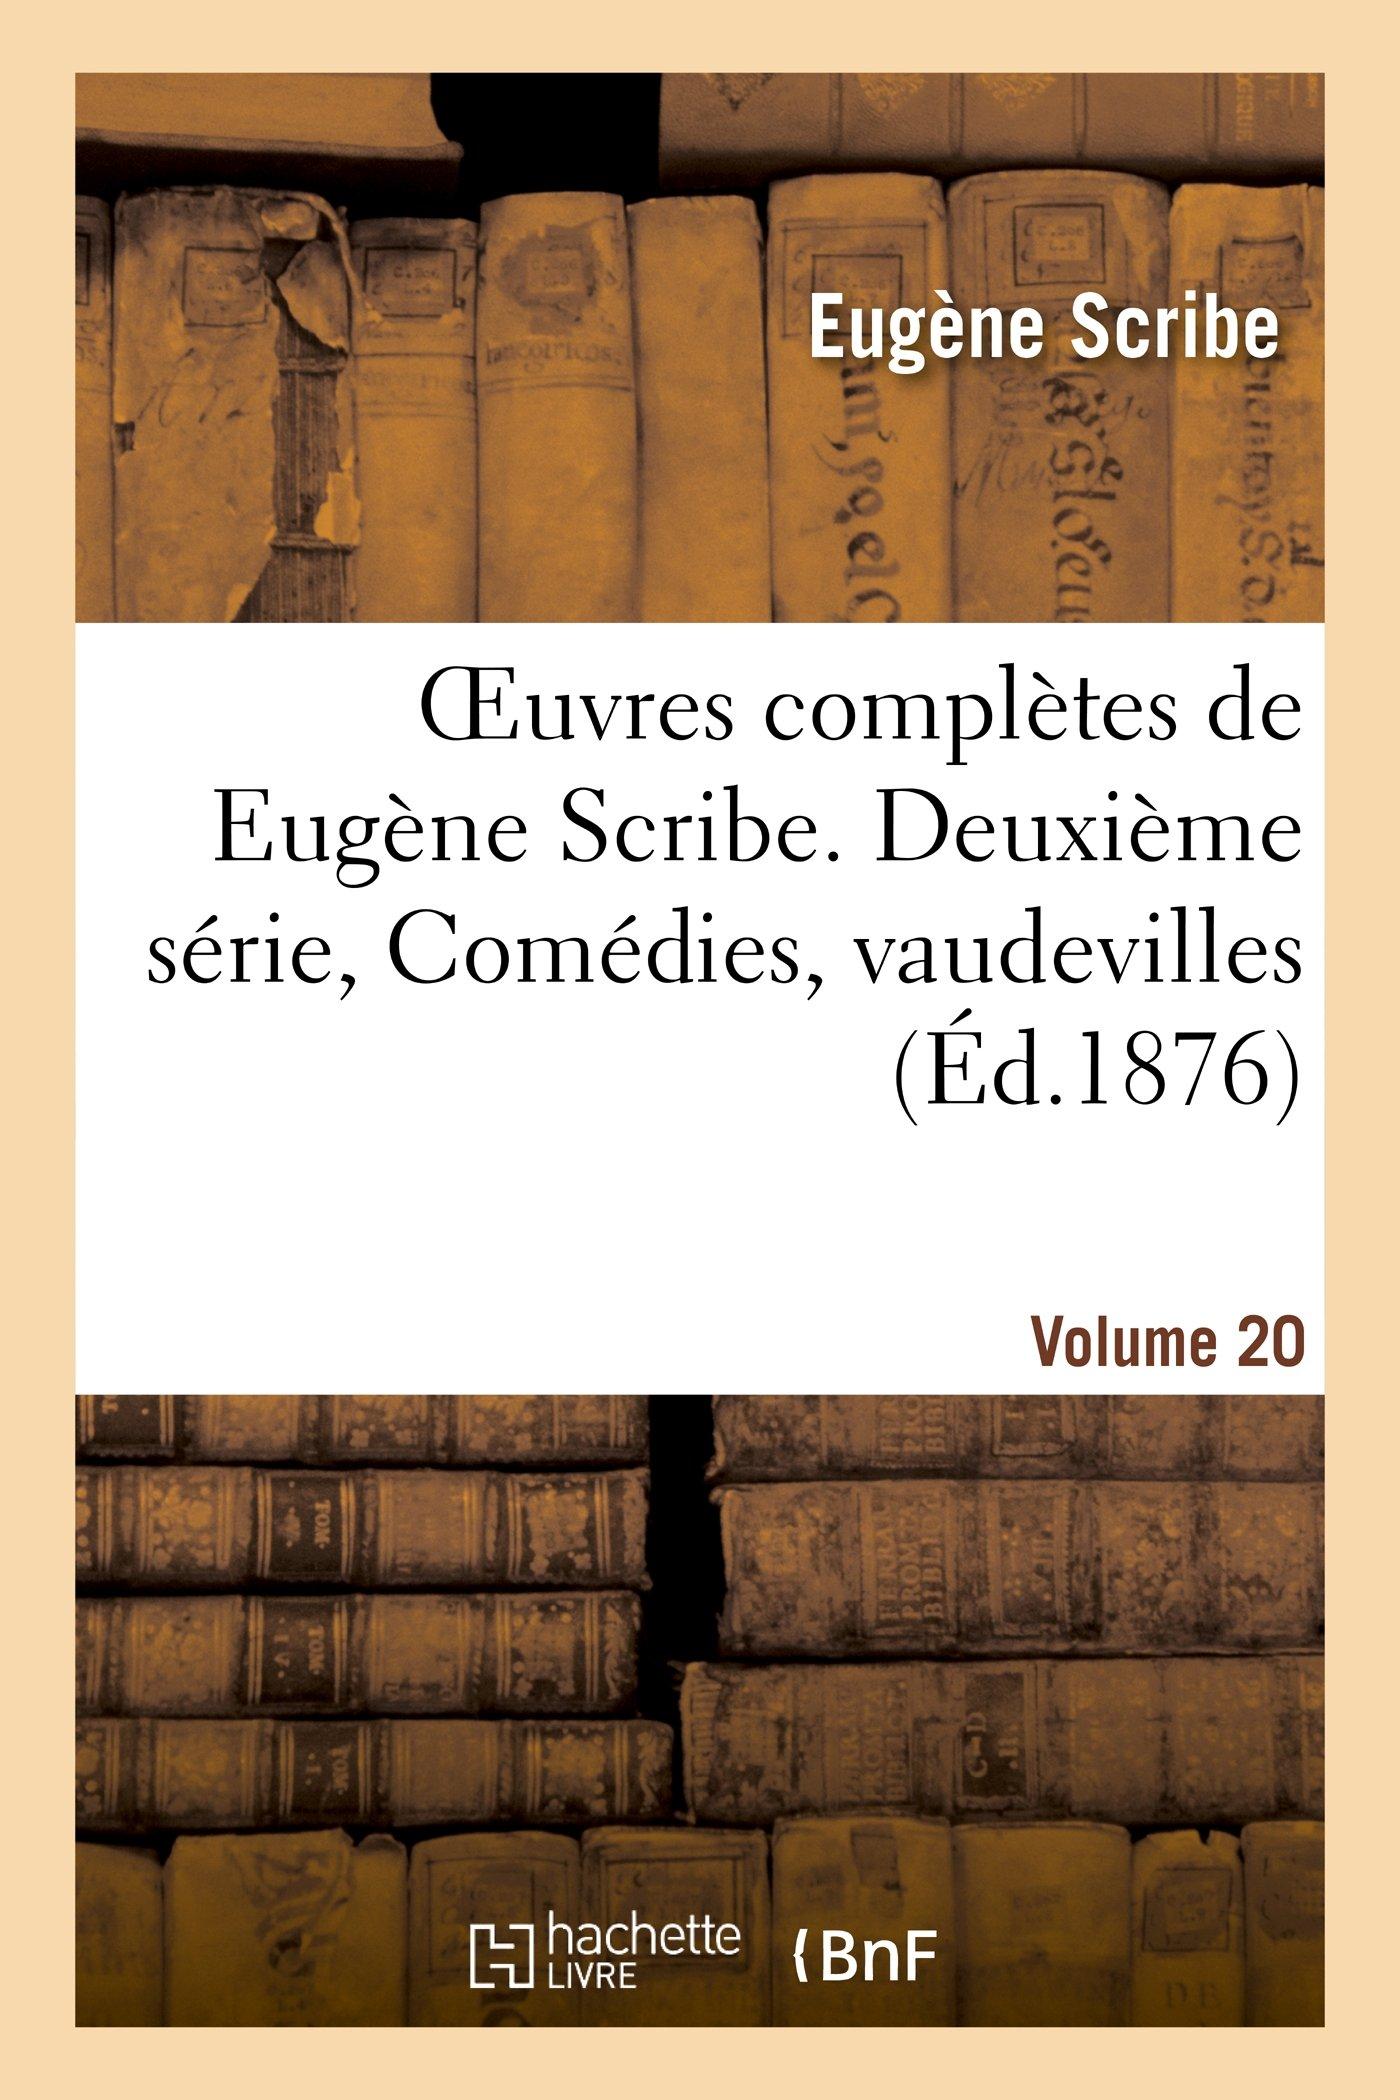 Oeuvres Completes de Eugene Scribe, Deuxieme Serie, Comedies, Vaudevilles, Vol. 20 (Litterature) (French Edition)